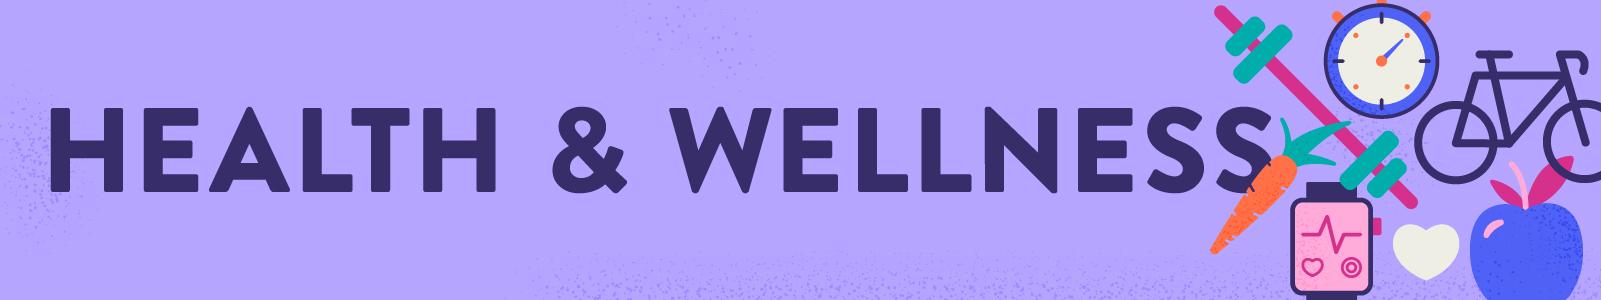 Health Wellness Header Narrow